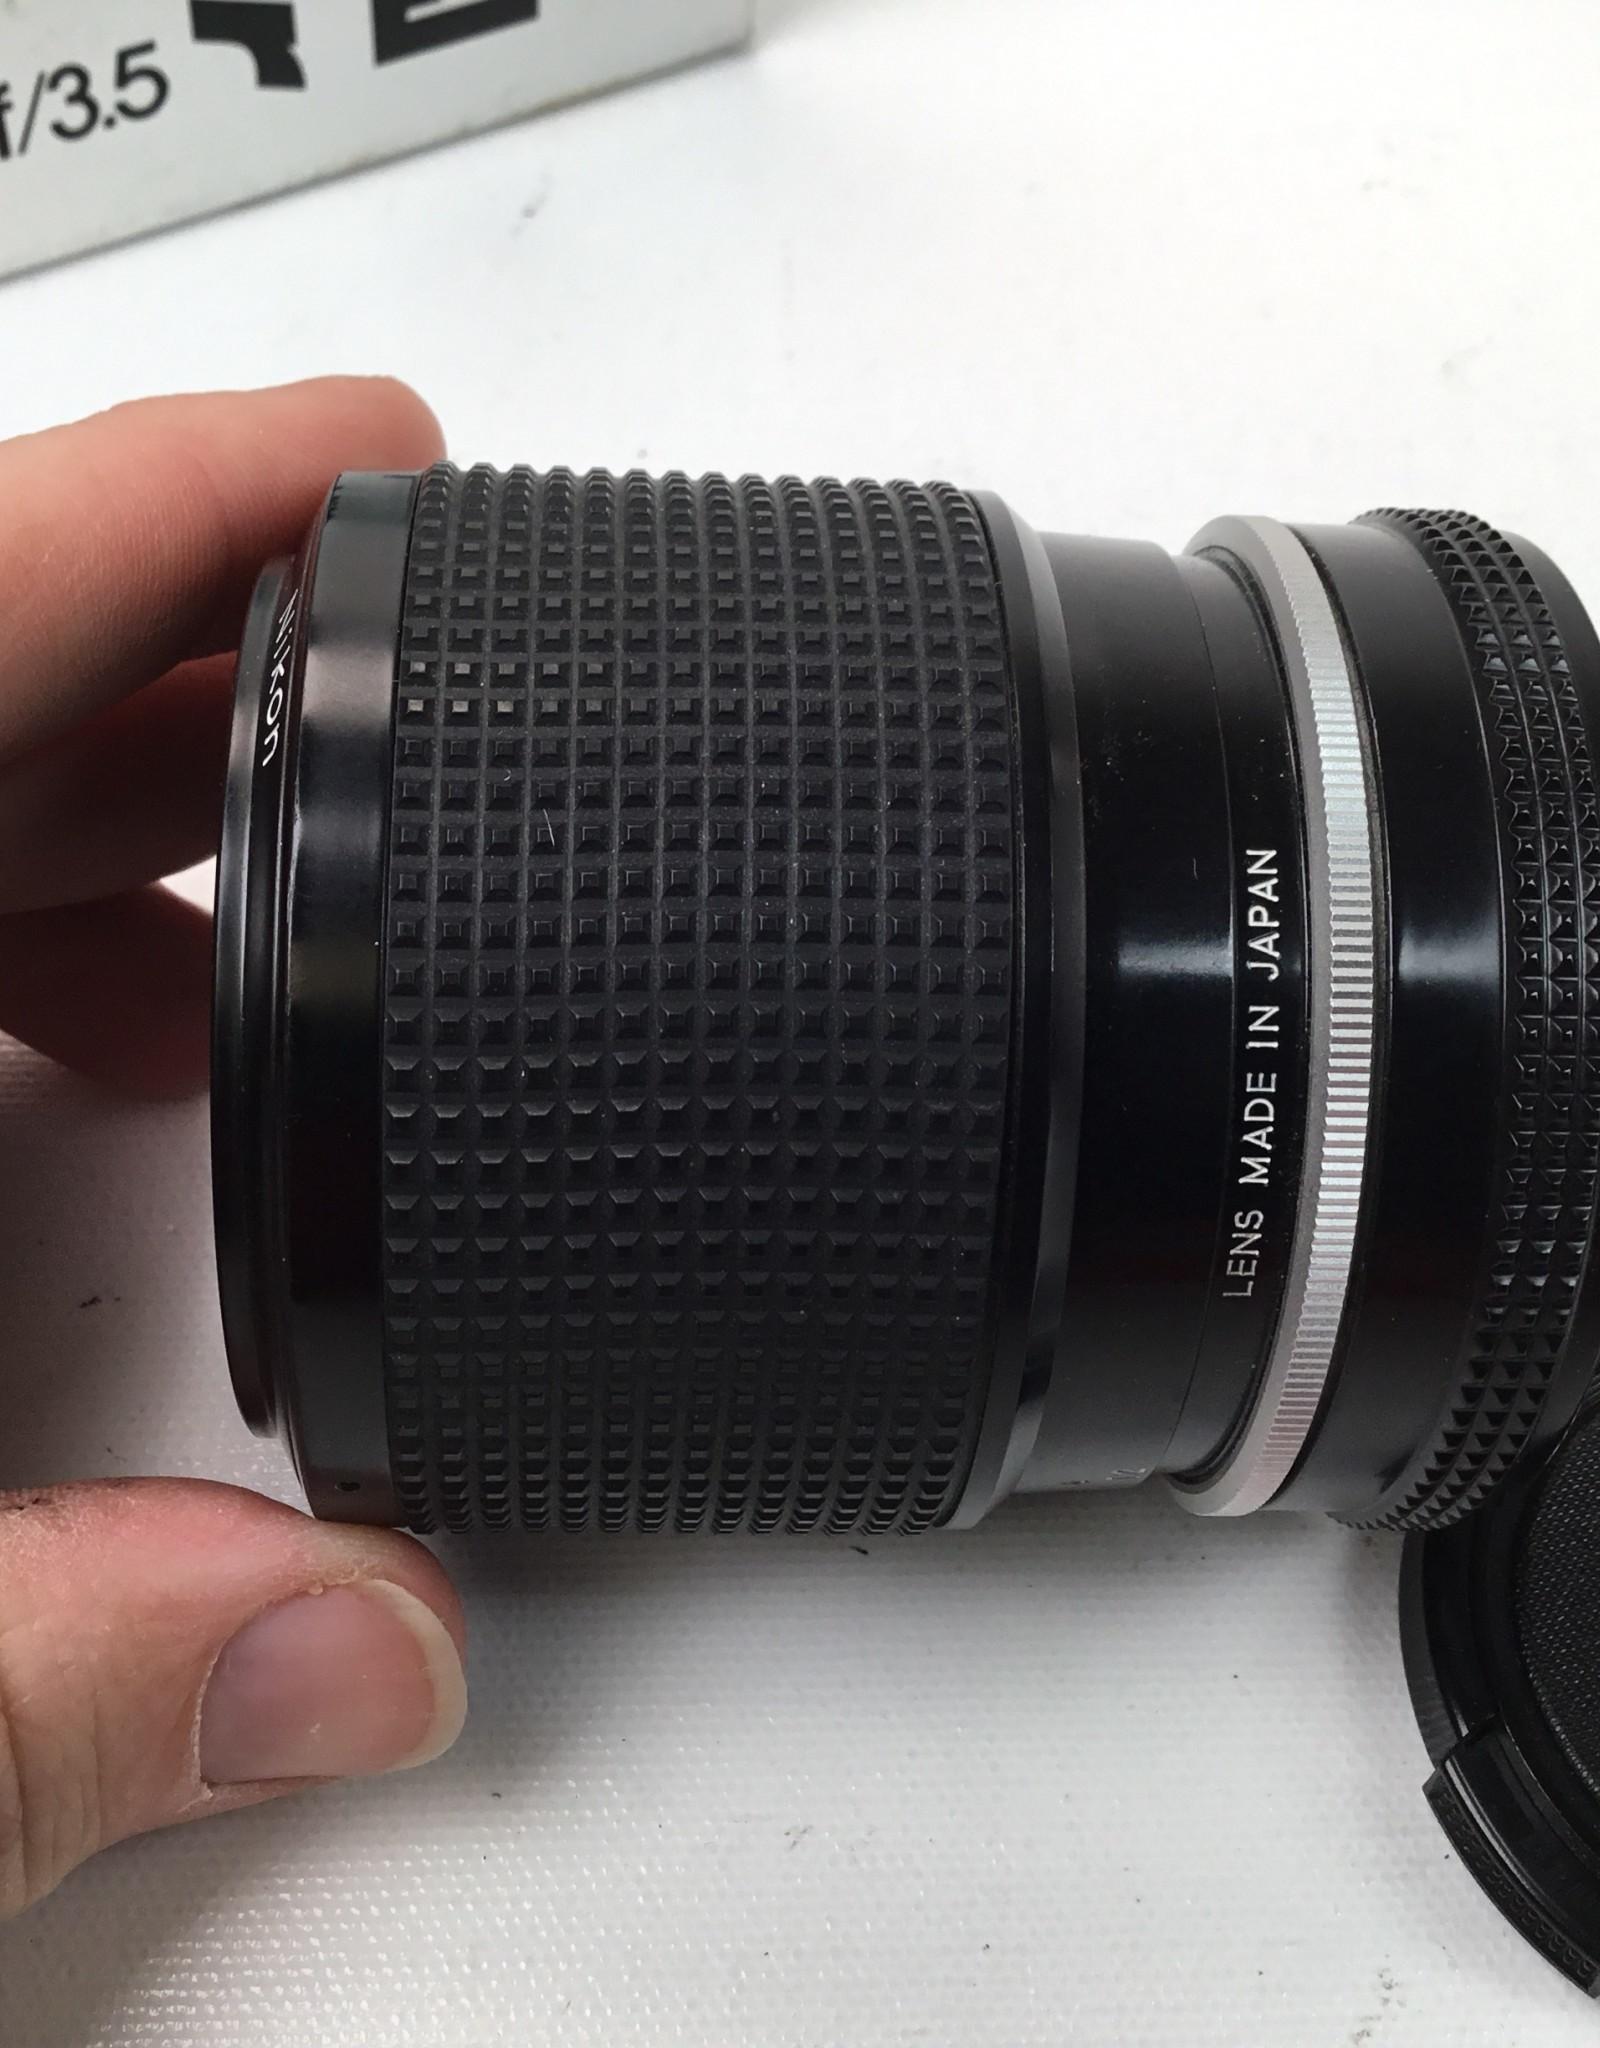 NIKON Nikon Zoom Nikkor 43-86mm f3.5 AI Lens in Box Used EX+